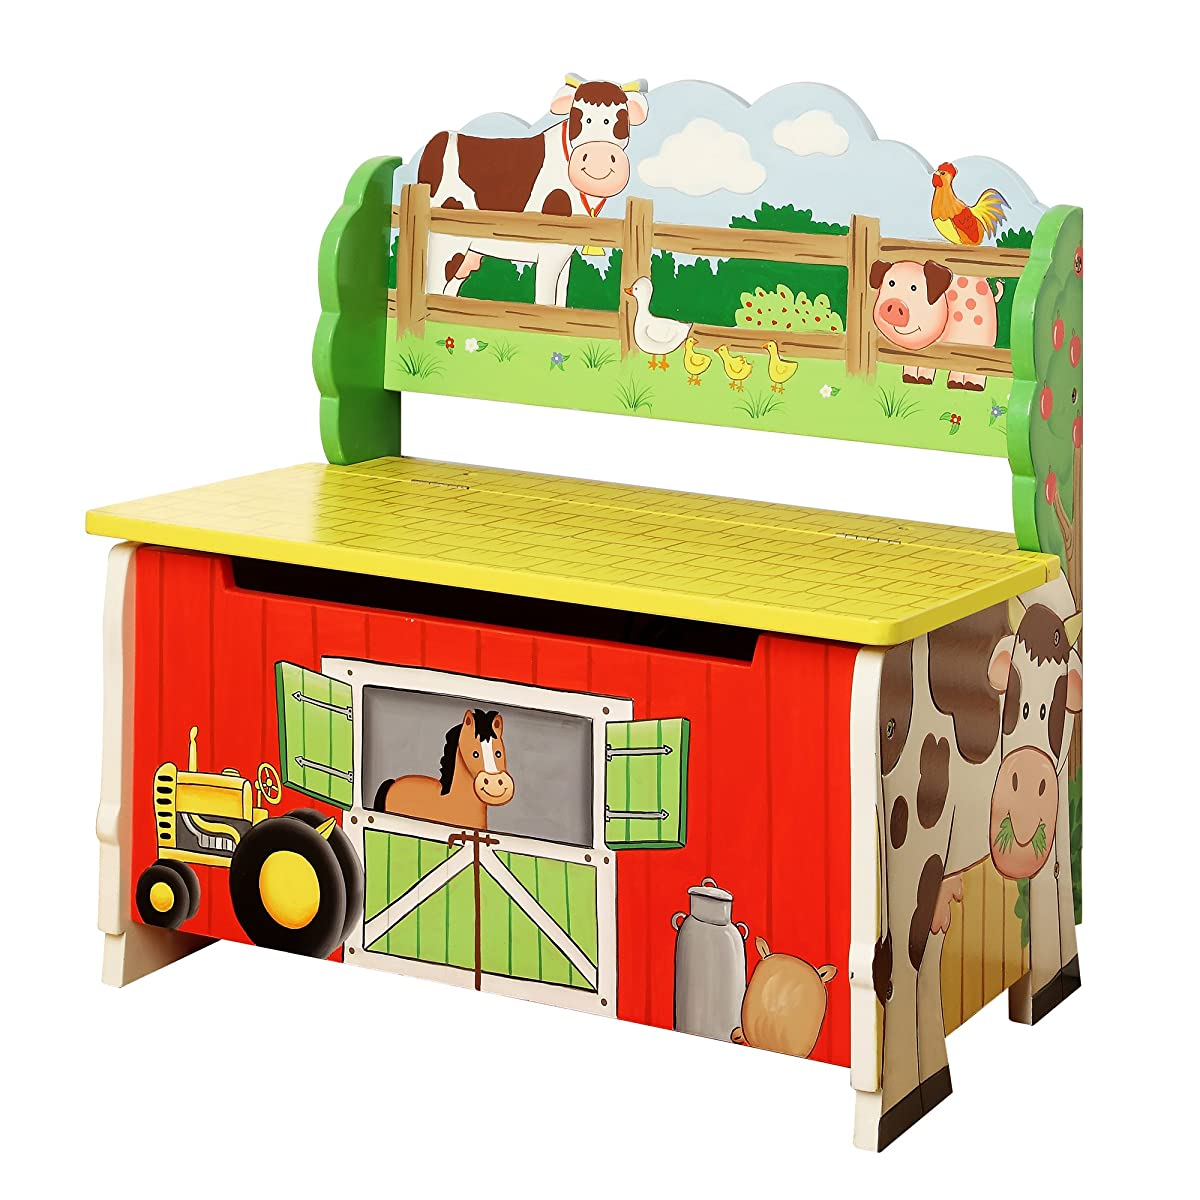 Fantasy Fields - Happy Farm Animals Thematic Kids Storage Bench| Imagination Inspiring Hand Crafted